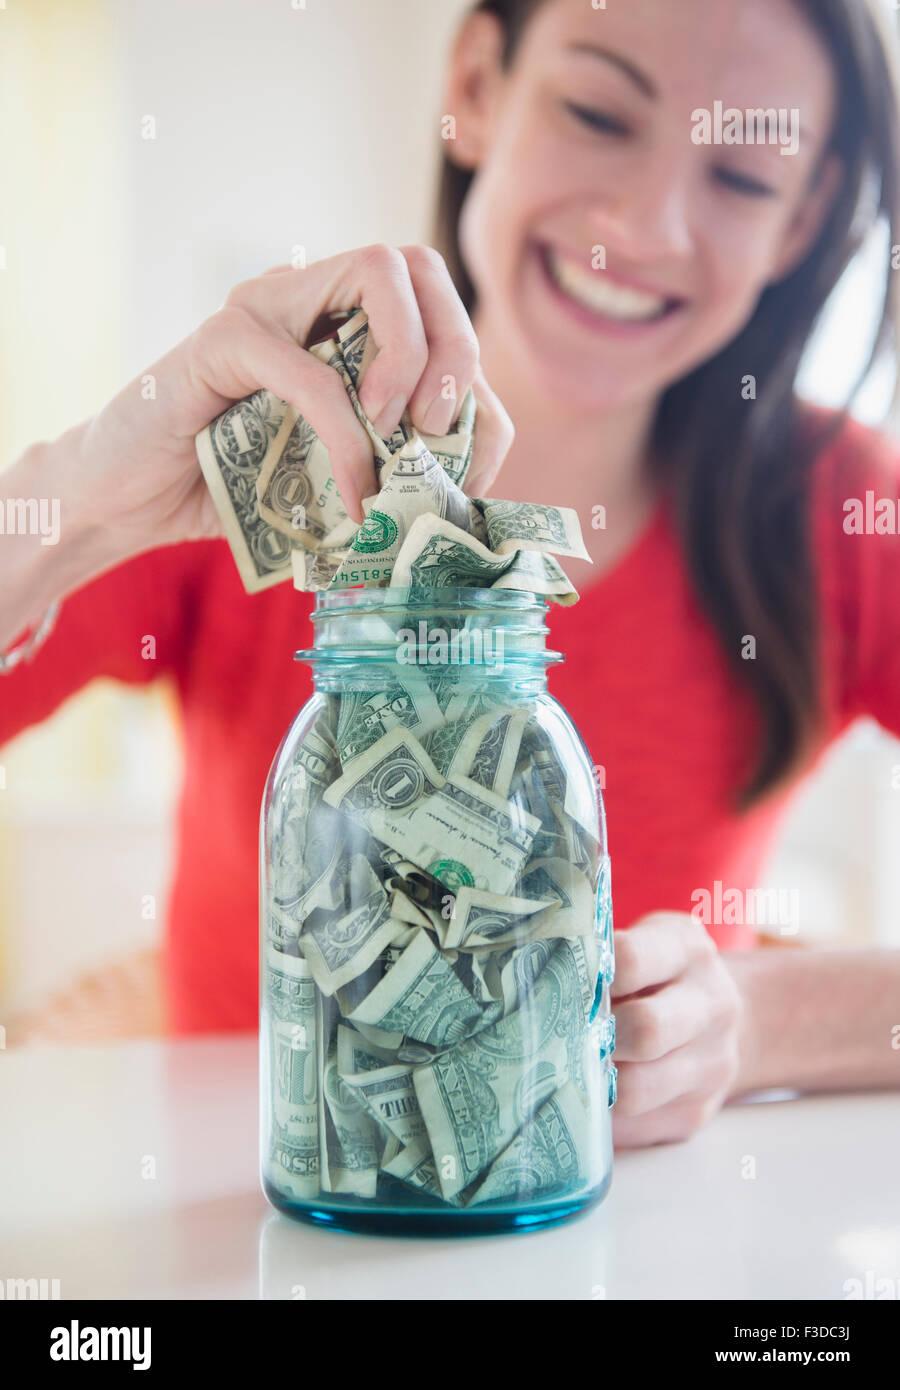 Woman putting money into jar - Stock Image